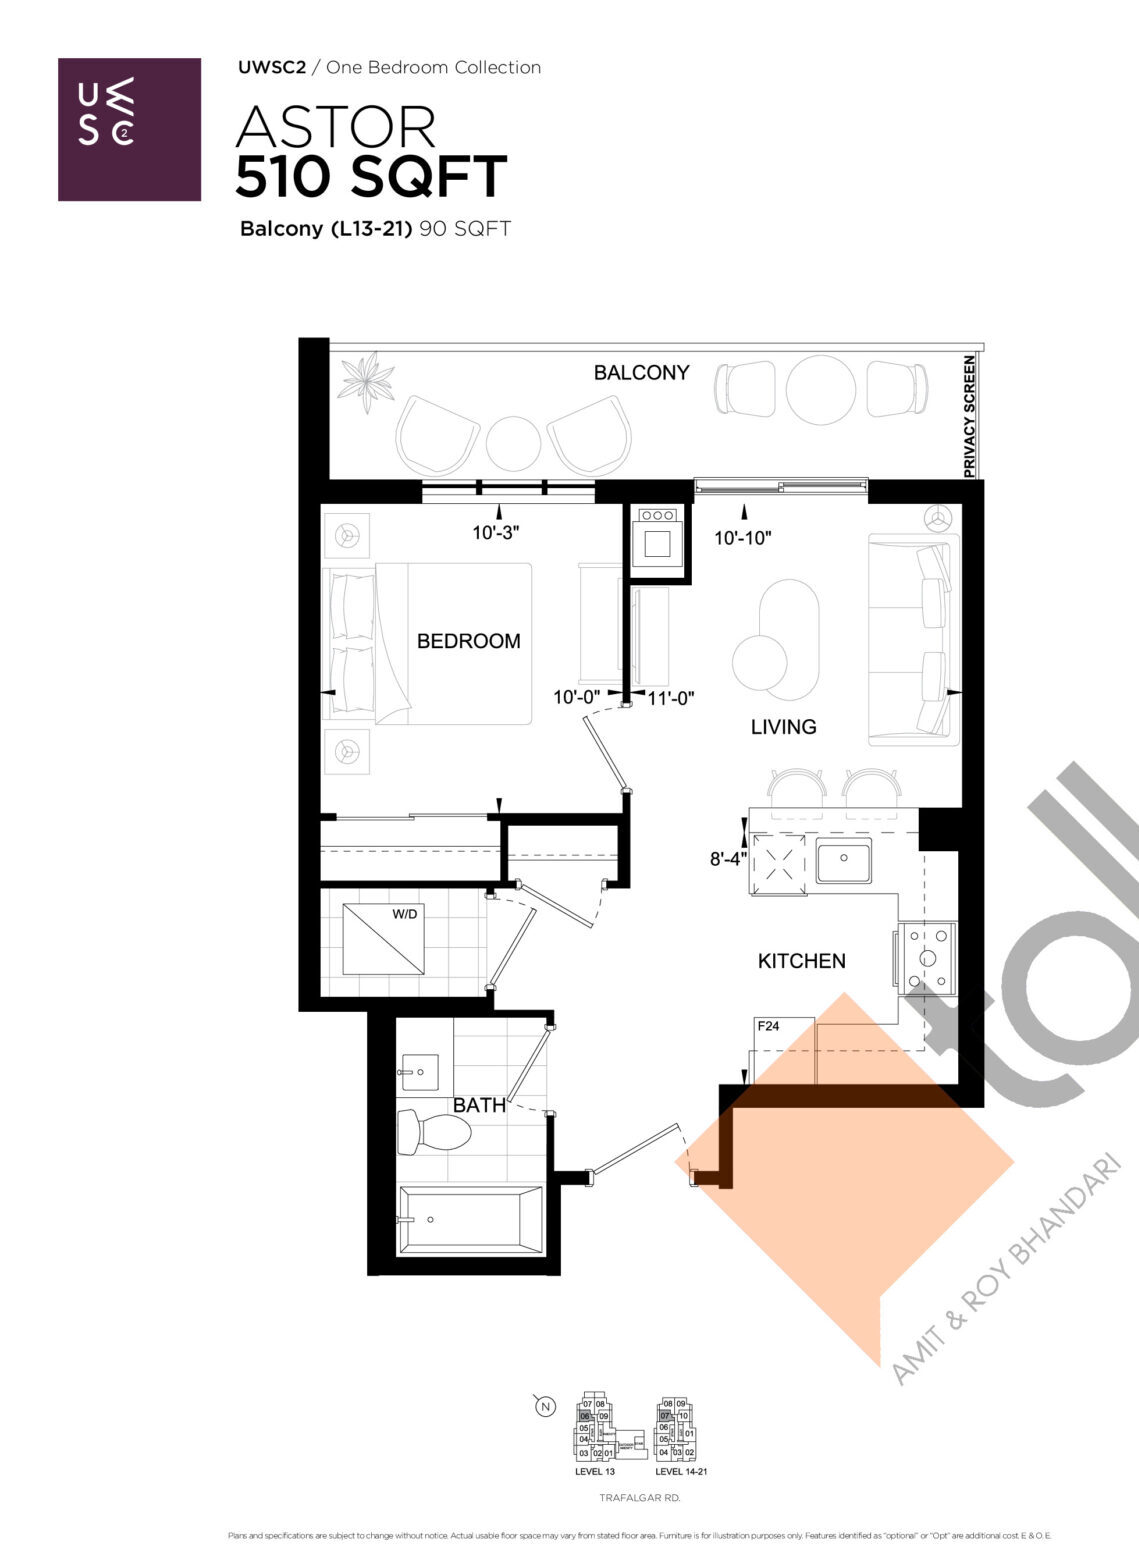 Astor Floor Plan at Upper West Side Condos 2 - 510 sq.ft